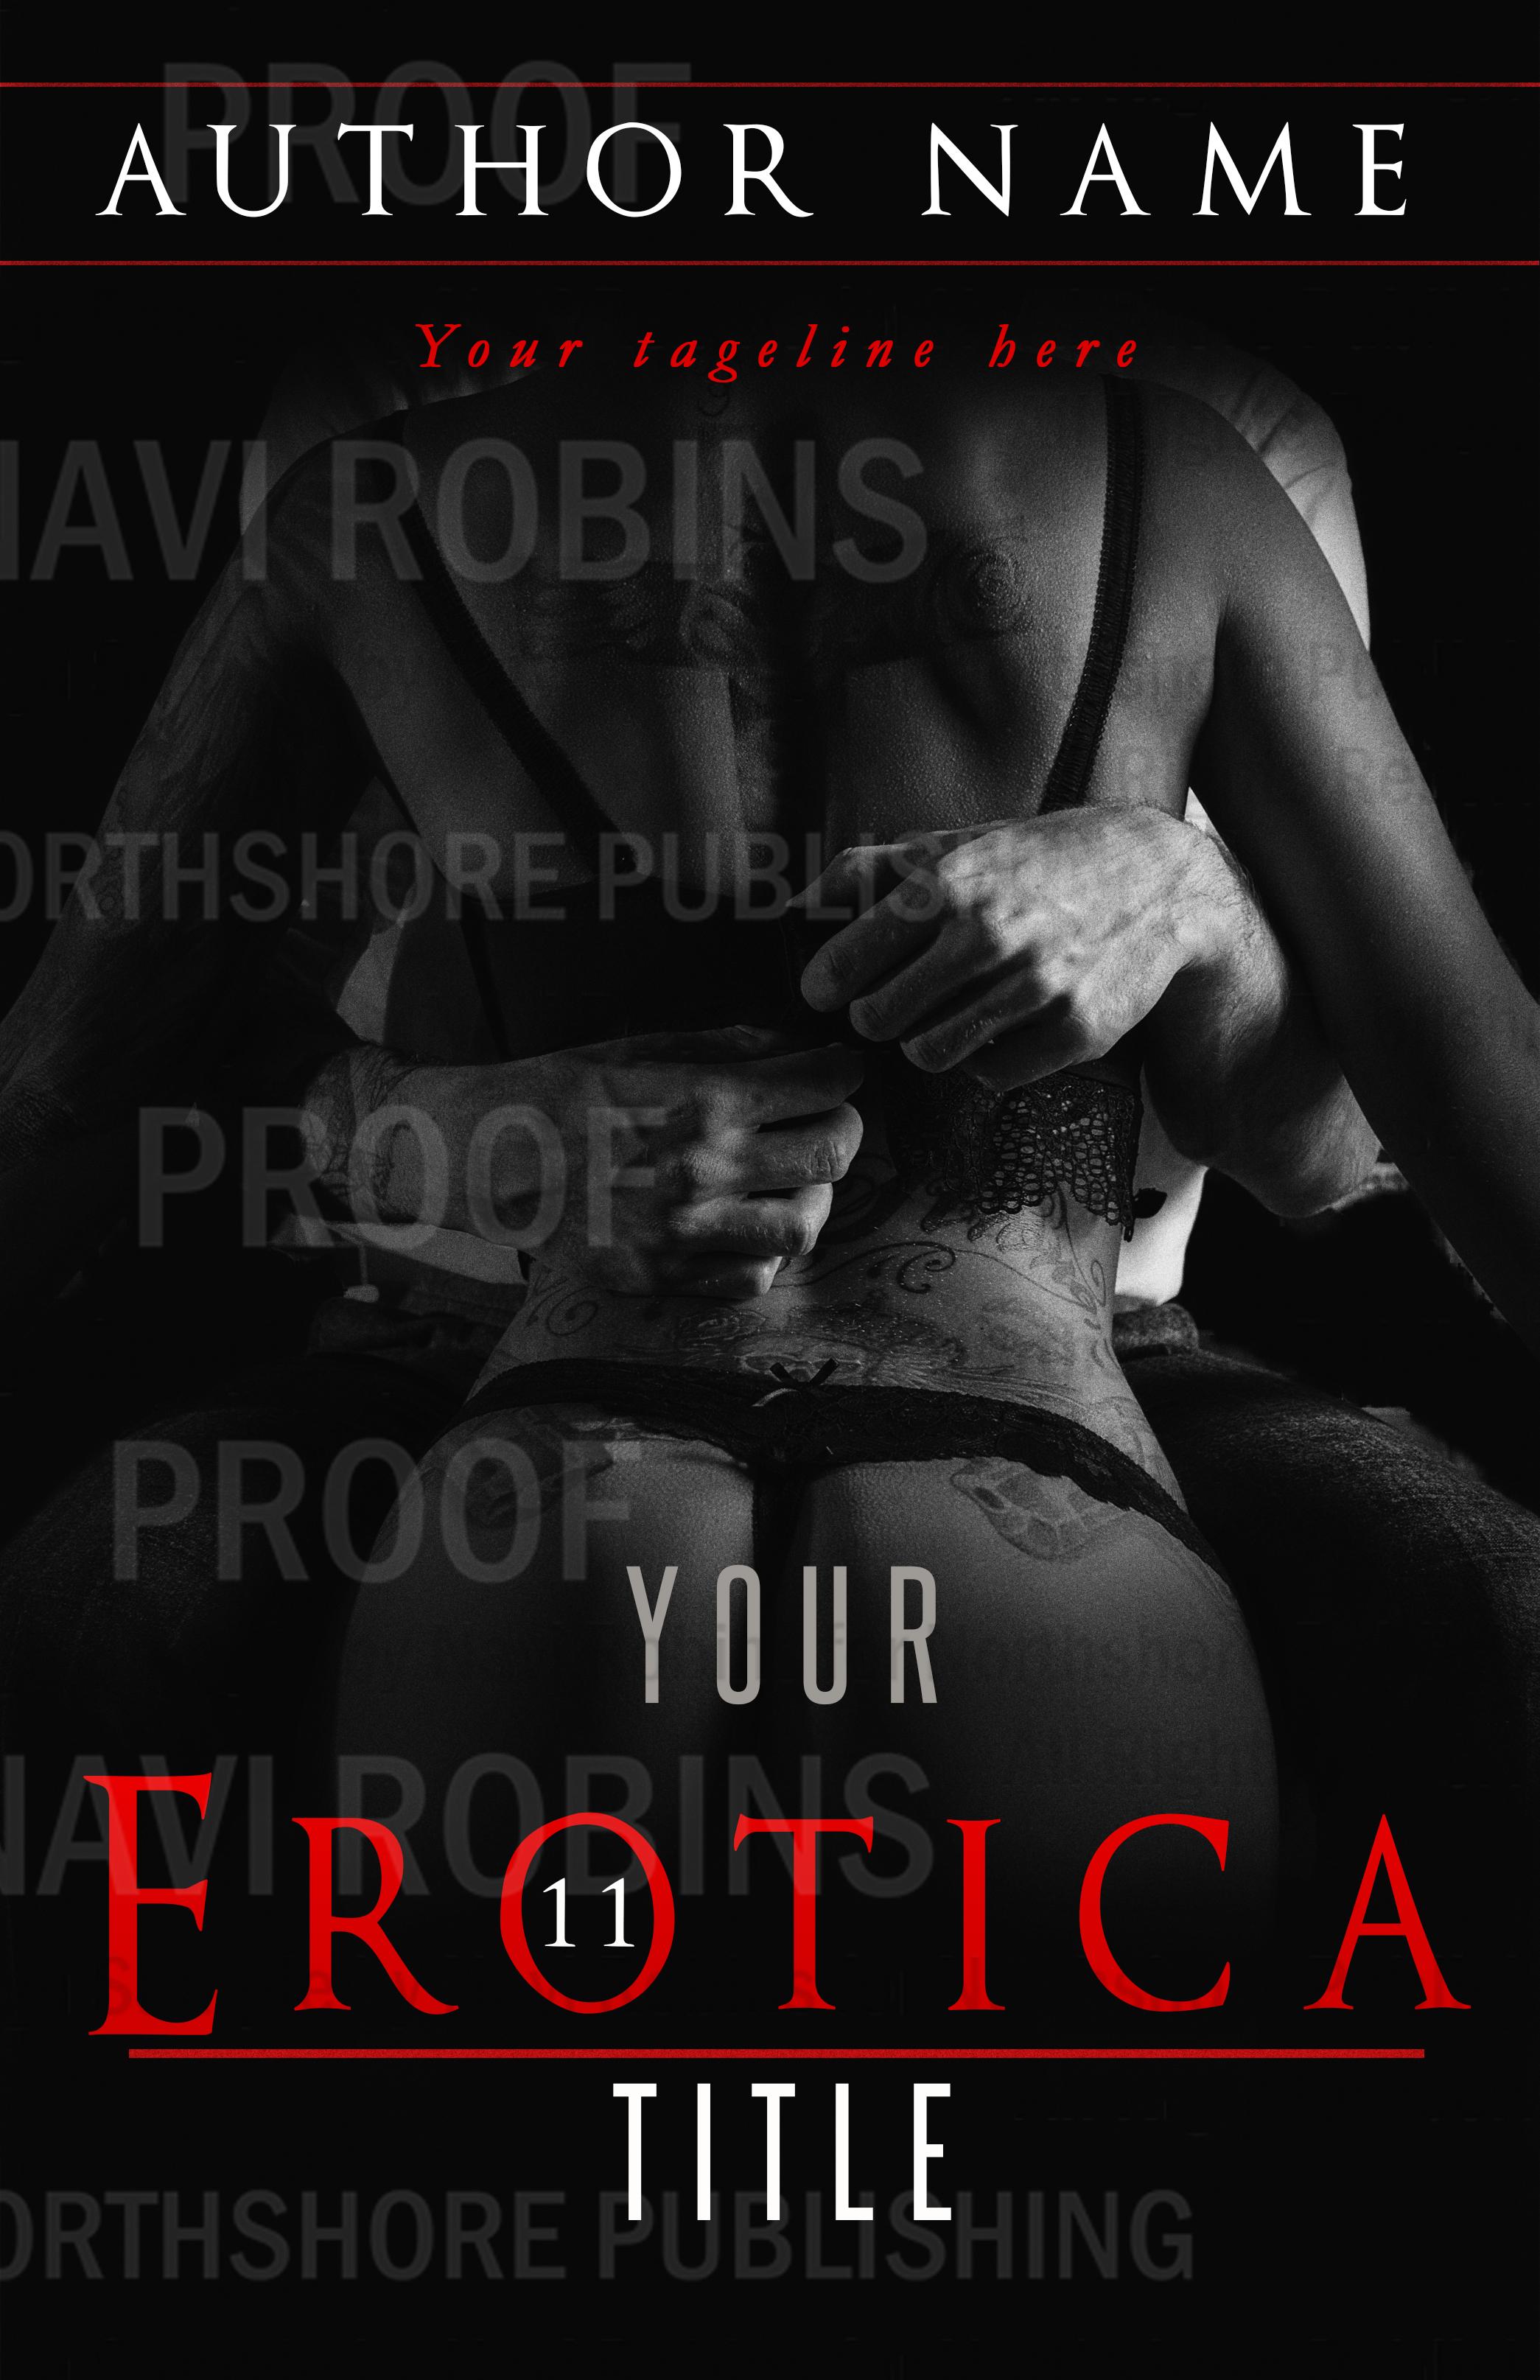 erotica cover 6-8-18